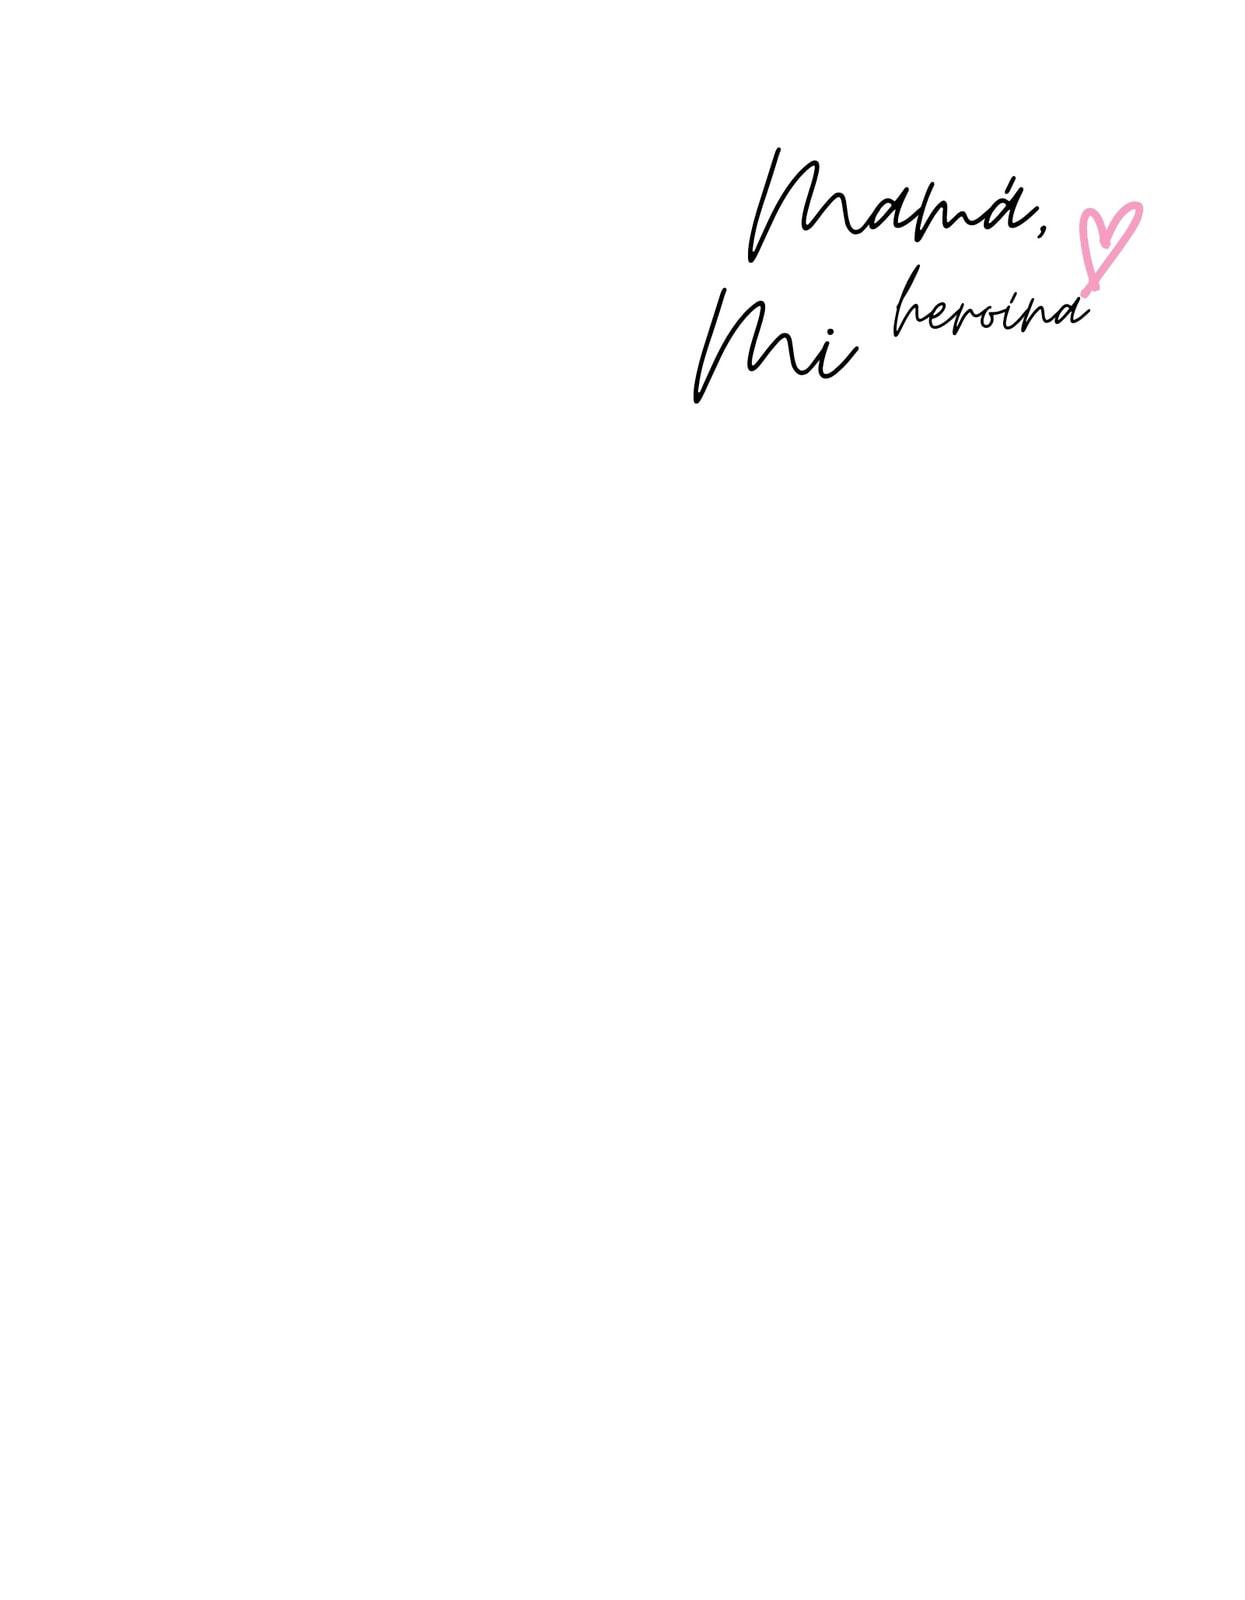 Rosa Manuscrito Acuarela Familia Día de la Madre Camiseta